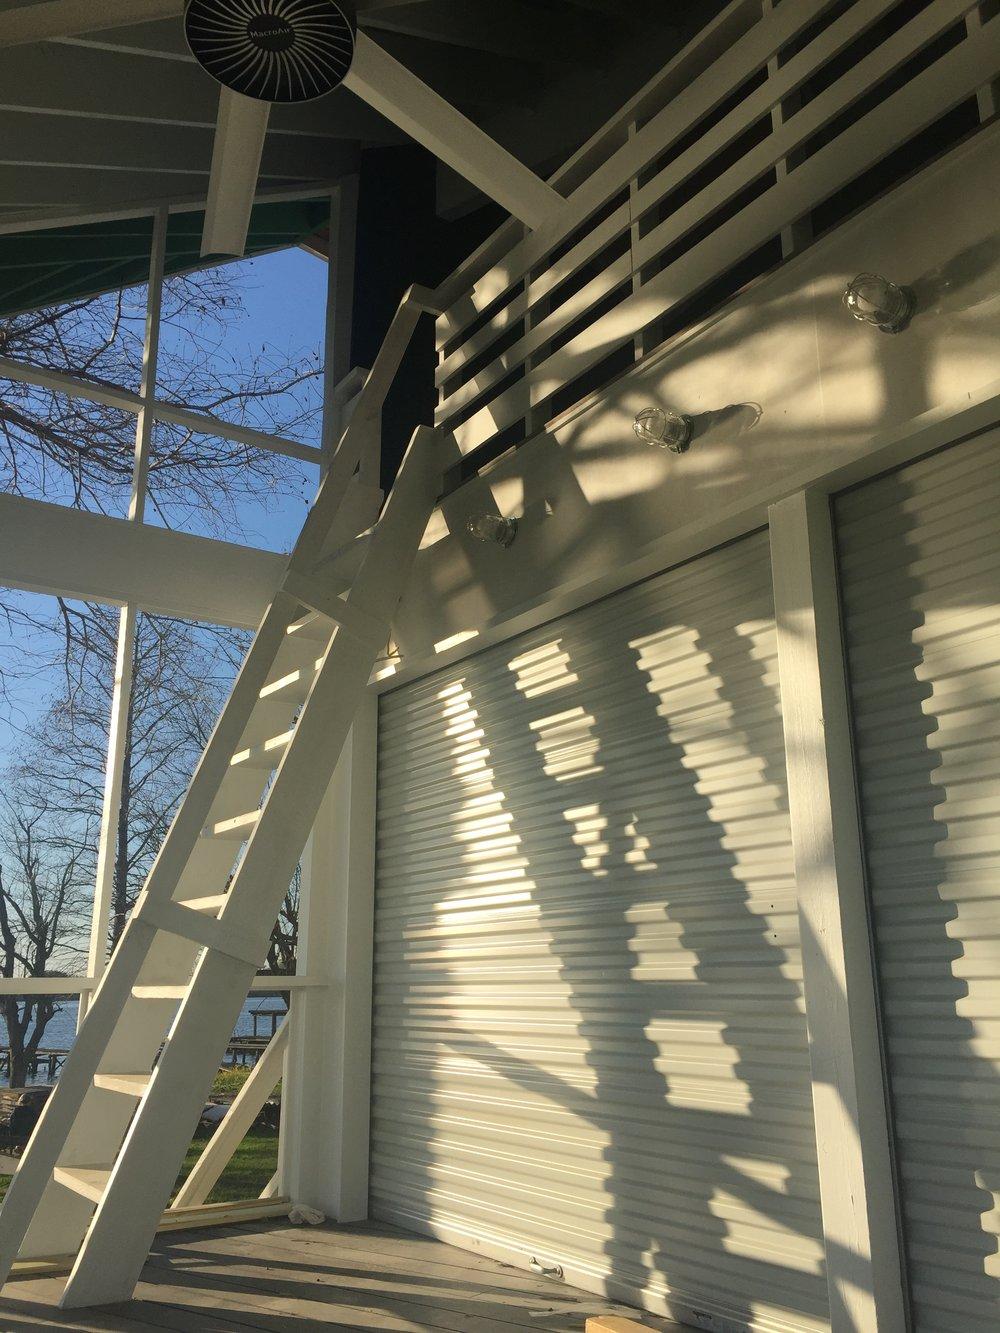 GATOR HOUSE: the porch